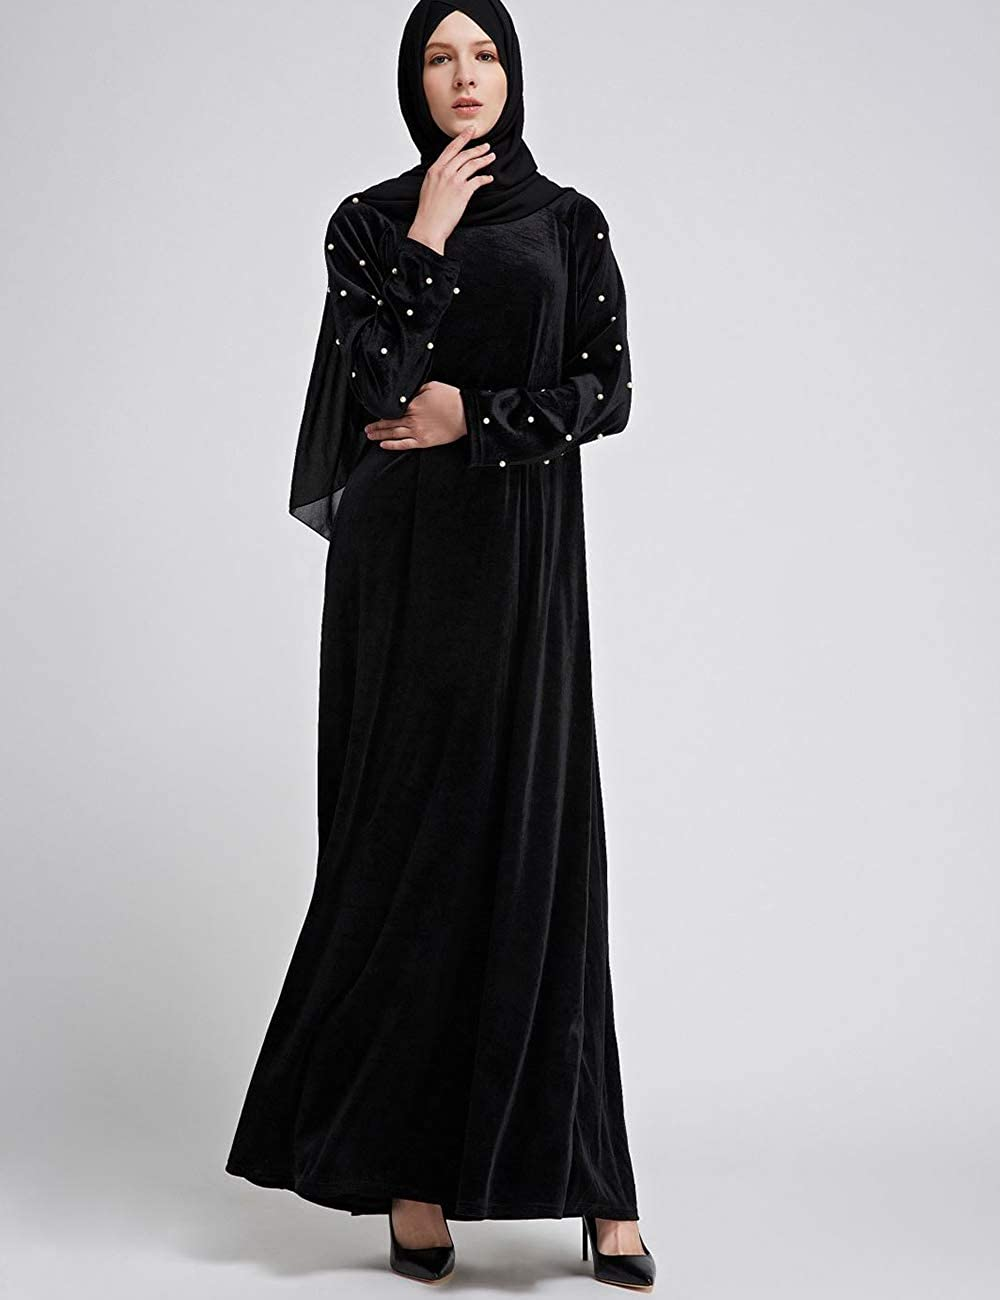 28185037779f3 Amazon.com  BESBOMIG Women s Velvet Dresses Beading Maxi Long Dress Abaya  Muslim Jilbab Kaftan  Clothing